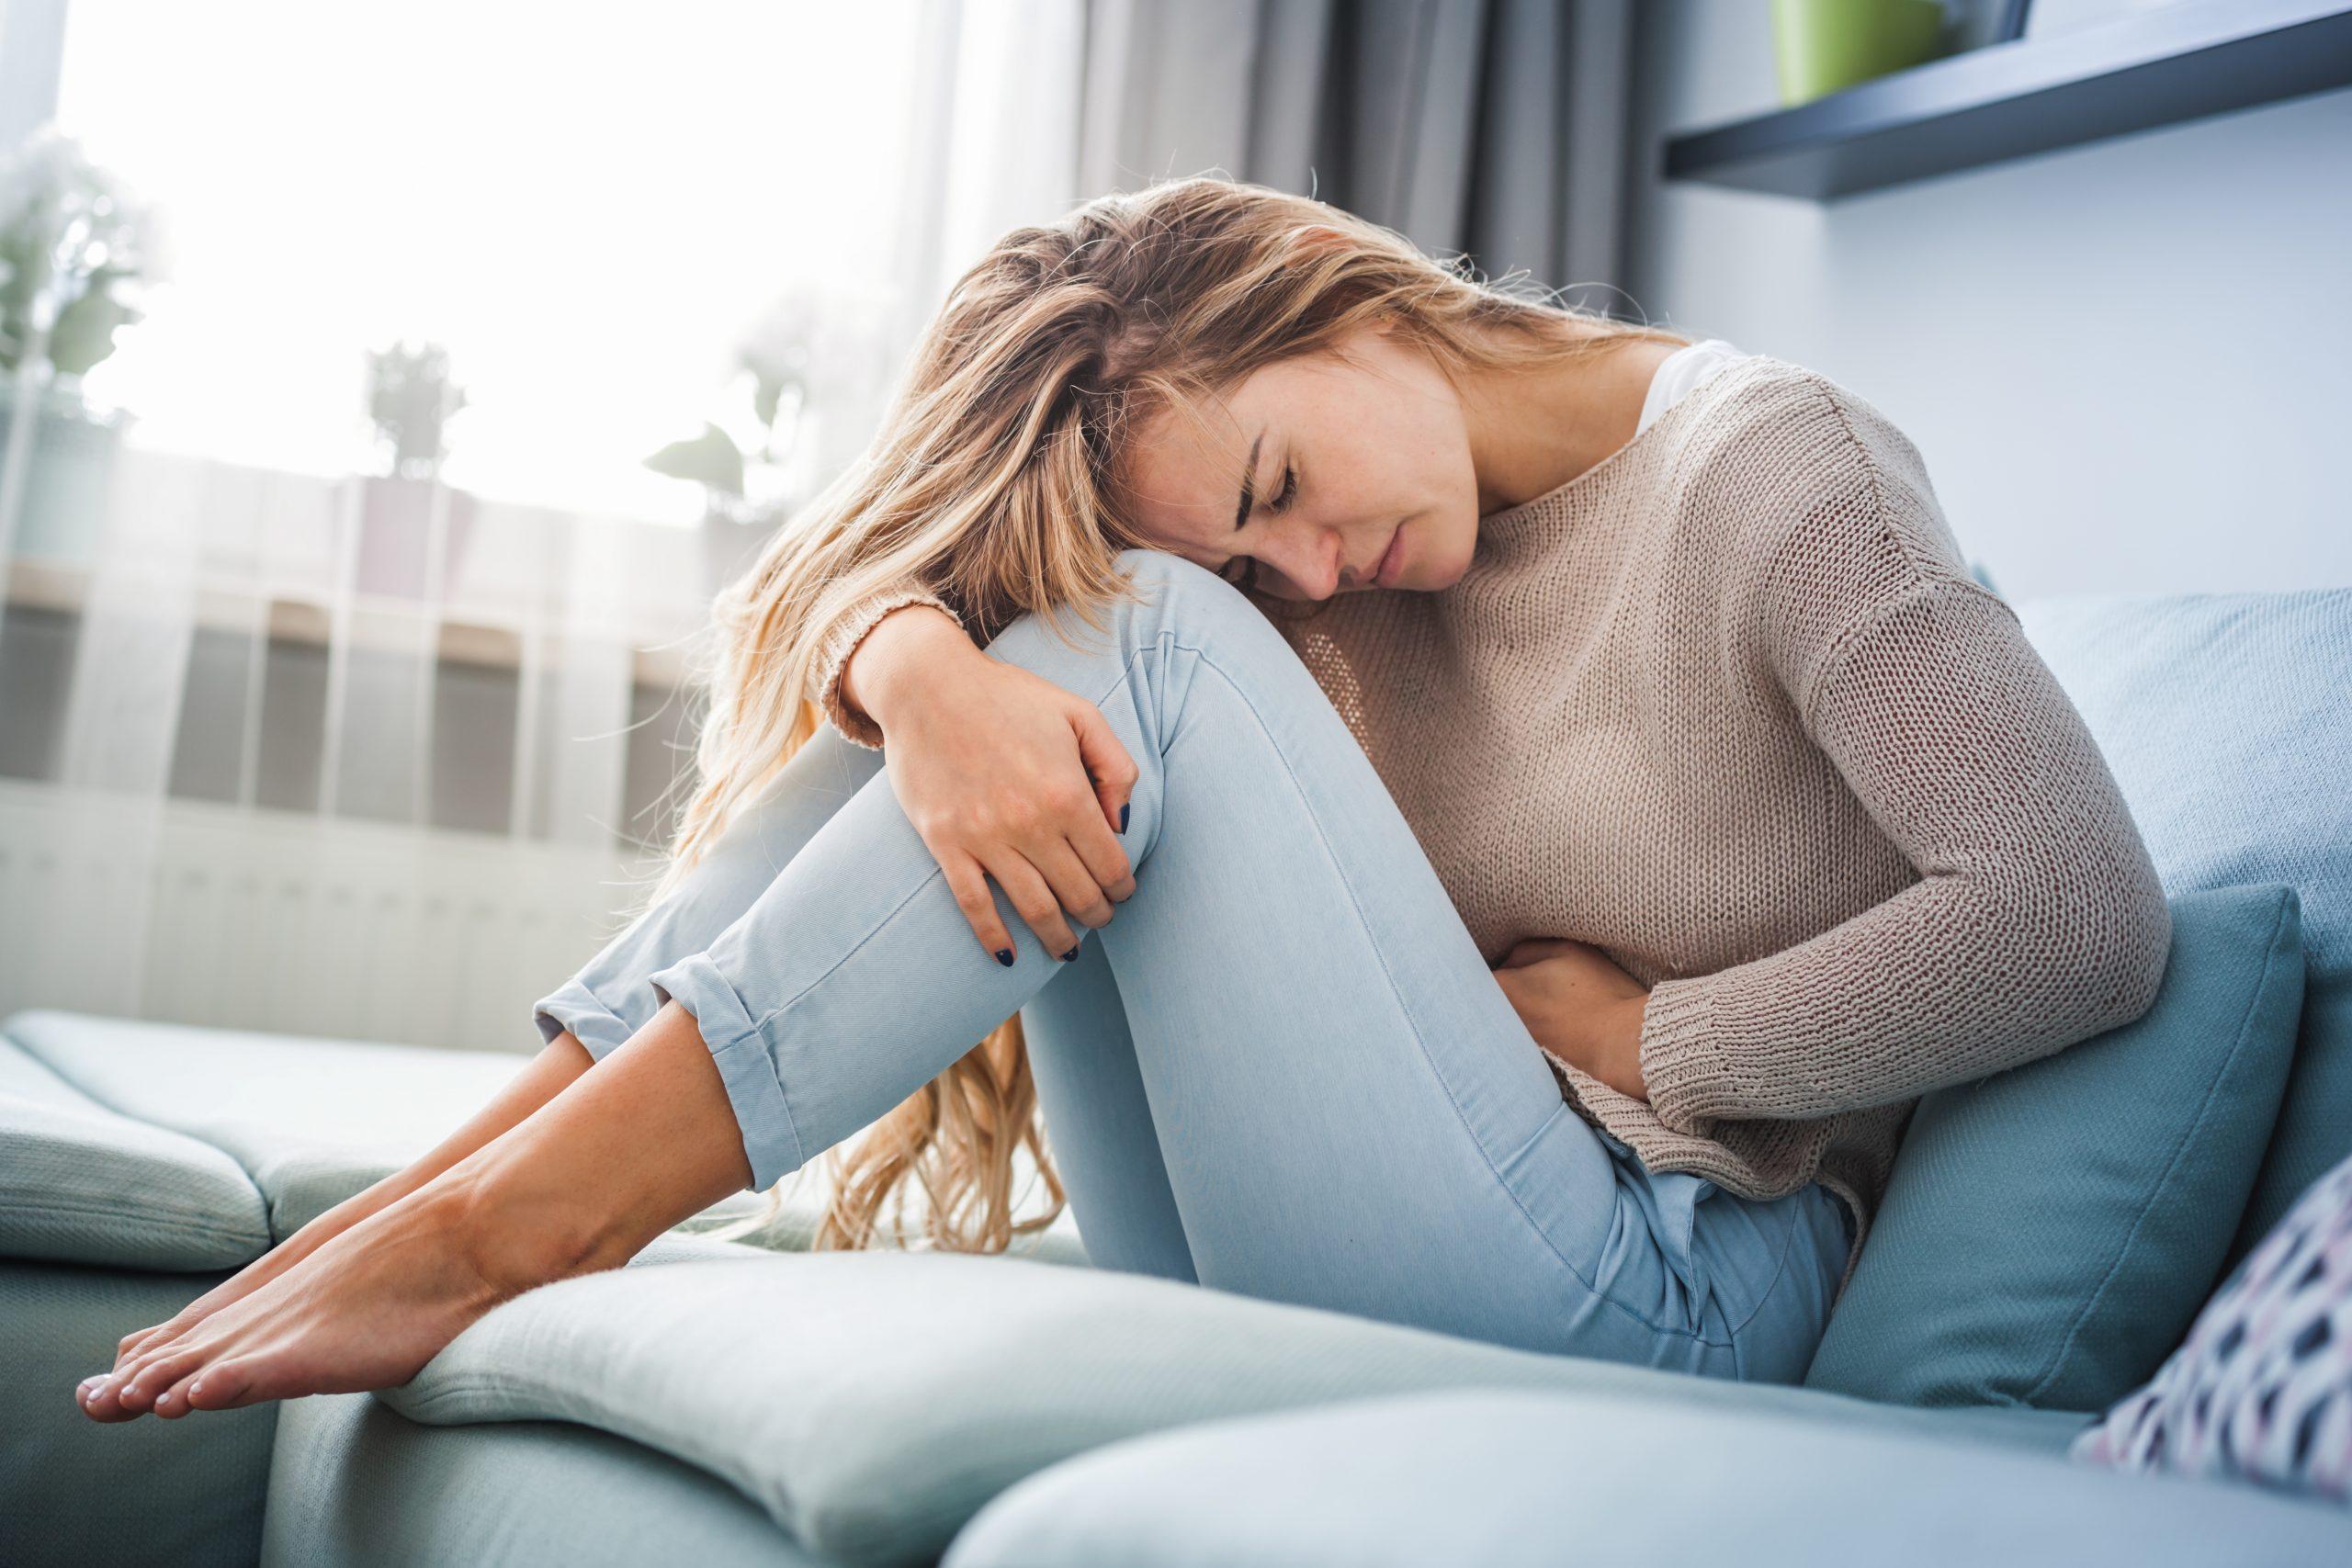 Magenprobleme: Welche gibt es? | Symptome & Hilfe | kanyo®